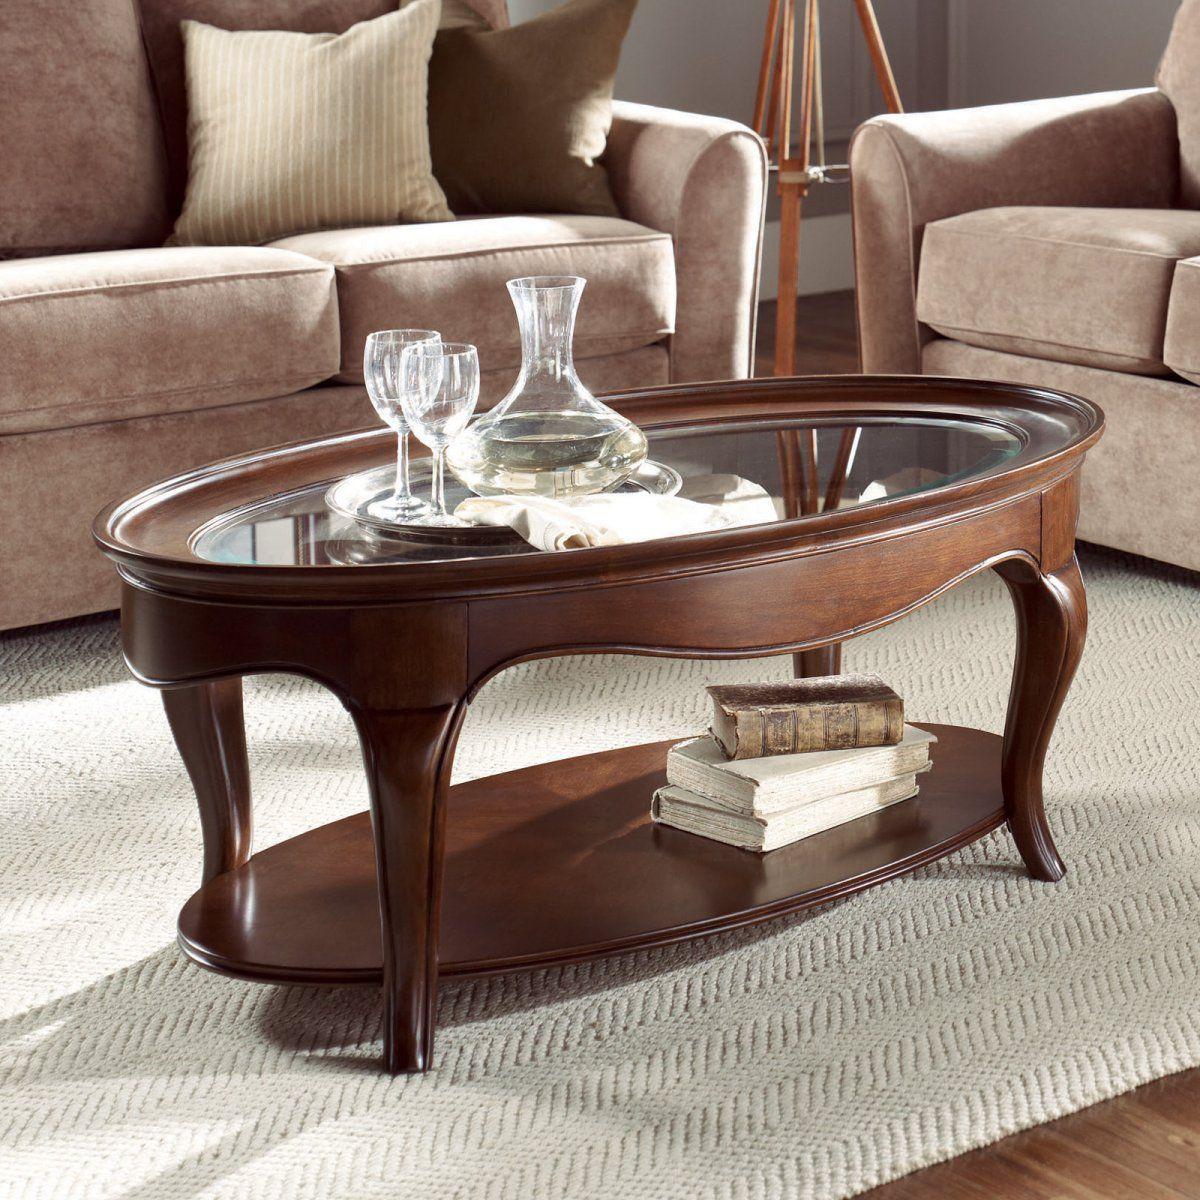 American Drew Cherry Grove Oval Coffee Table Oval Glass Coffee Table Coffee Table Coffee Table Wood [ 1200 x 1200 Pixel ]